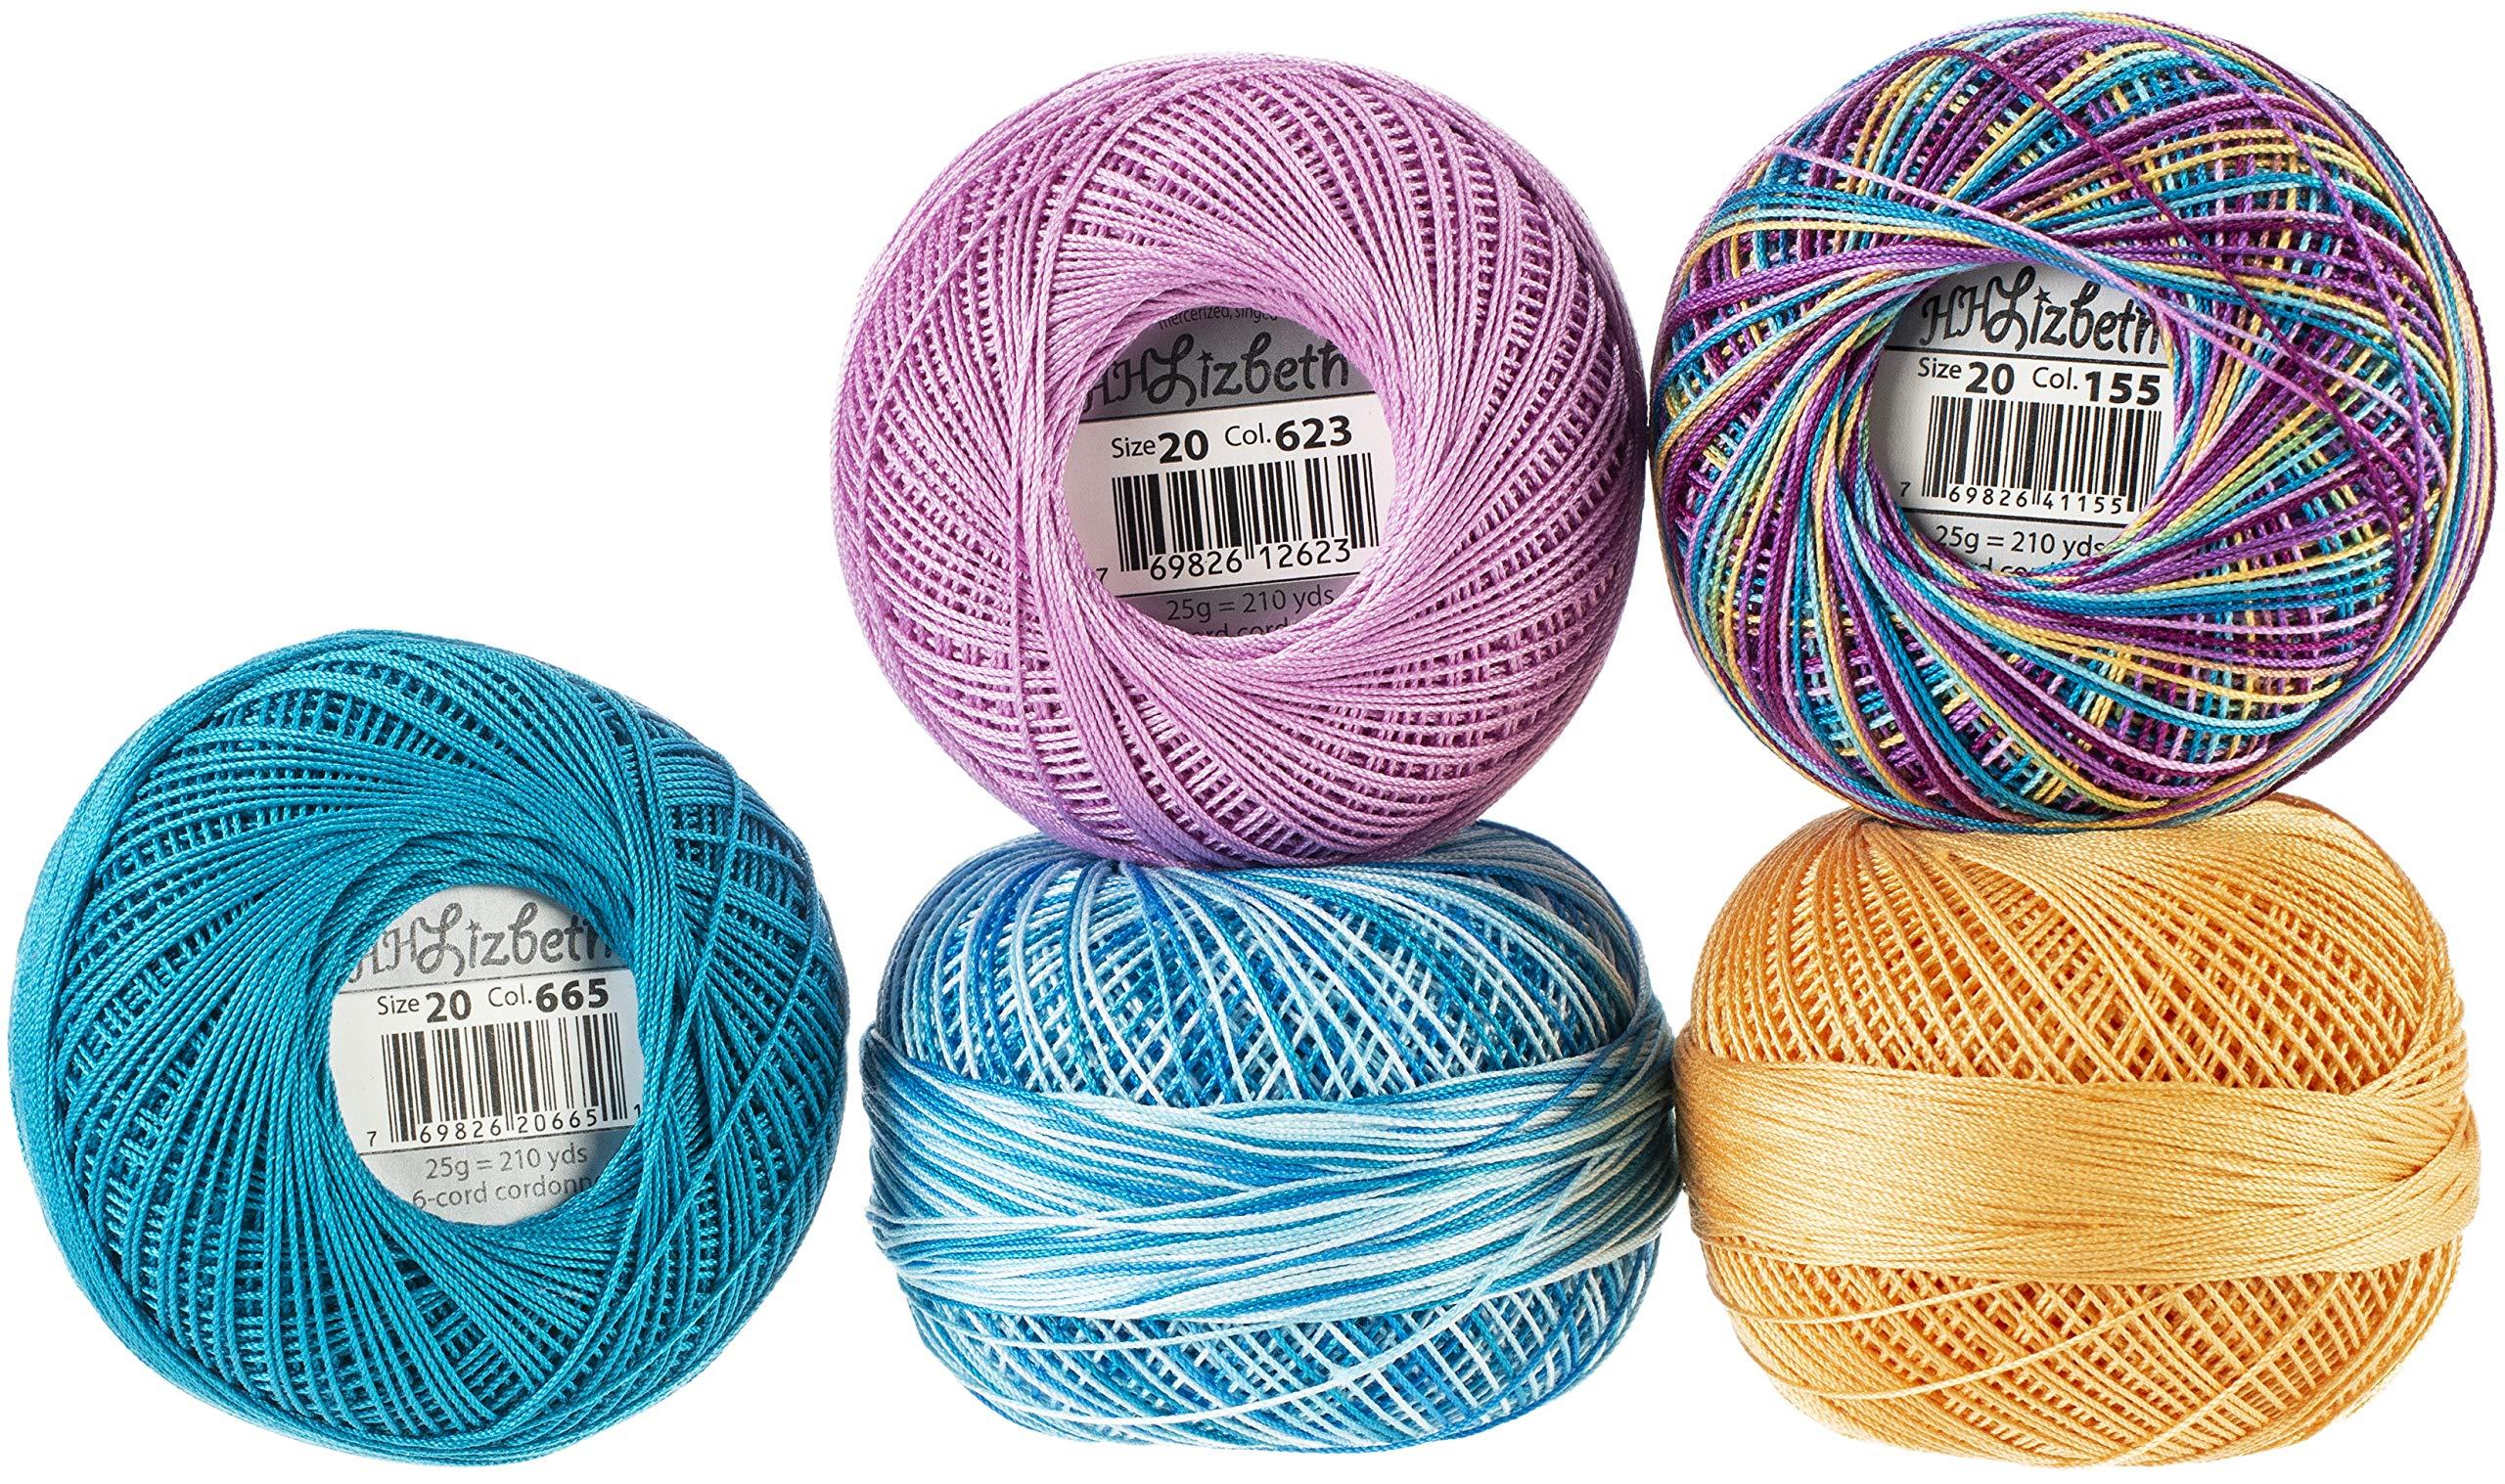 Handy Hands Lizbeth Specialty Pack Cordonnet Cotton Size 20-ocean View 5/pkg by Handy Hands (Image #1)